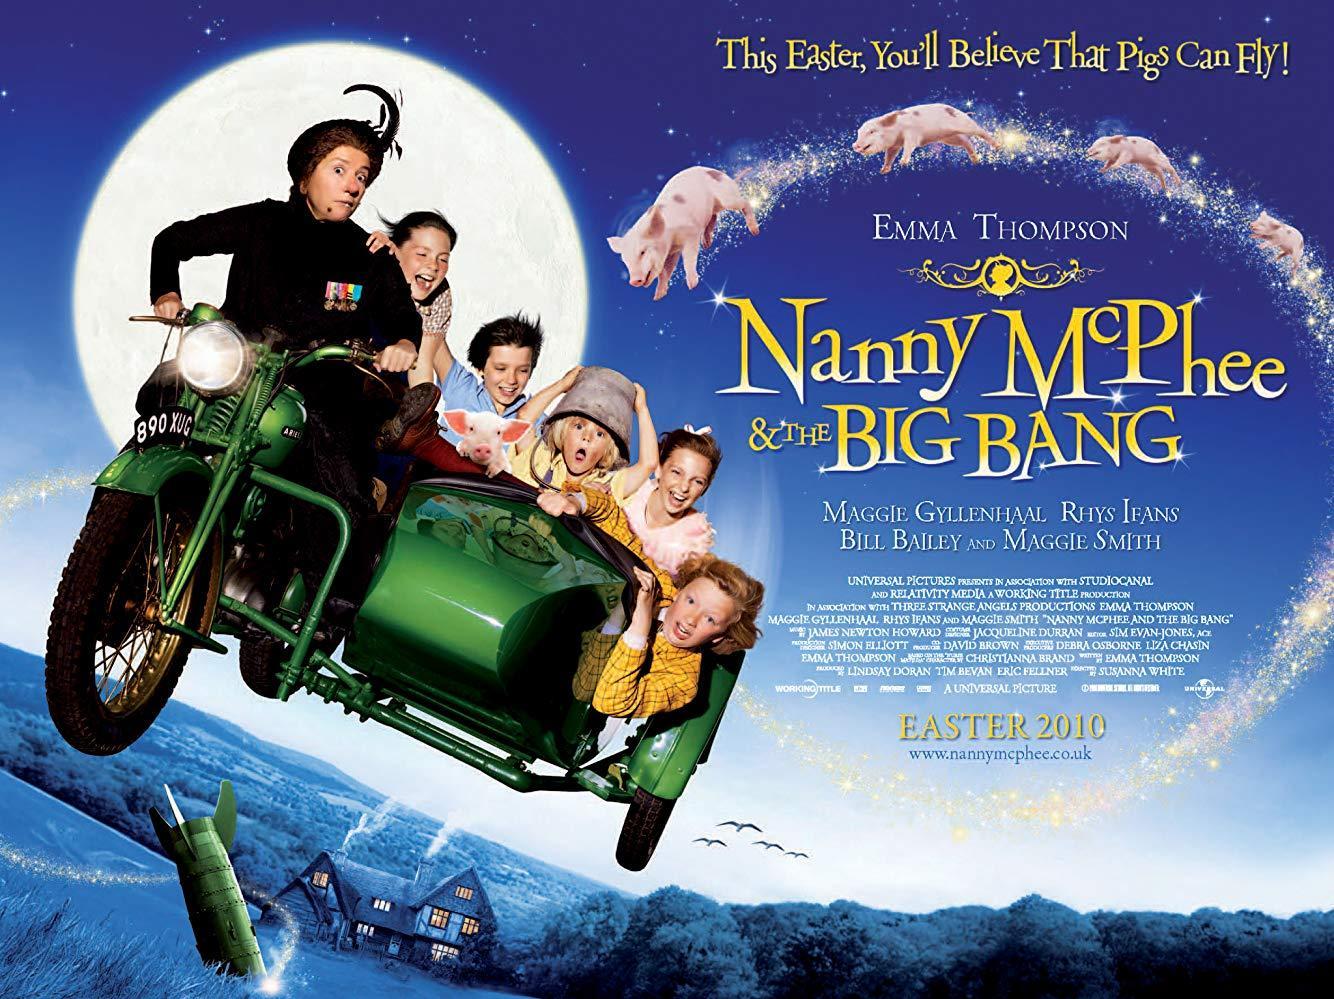 مشاهدة فيلم Nanny McPhee And The Big Bang 2010 HD مترجم كامل اون لاين